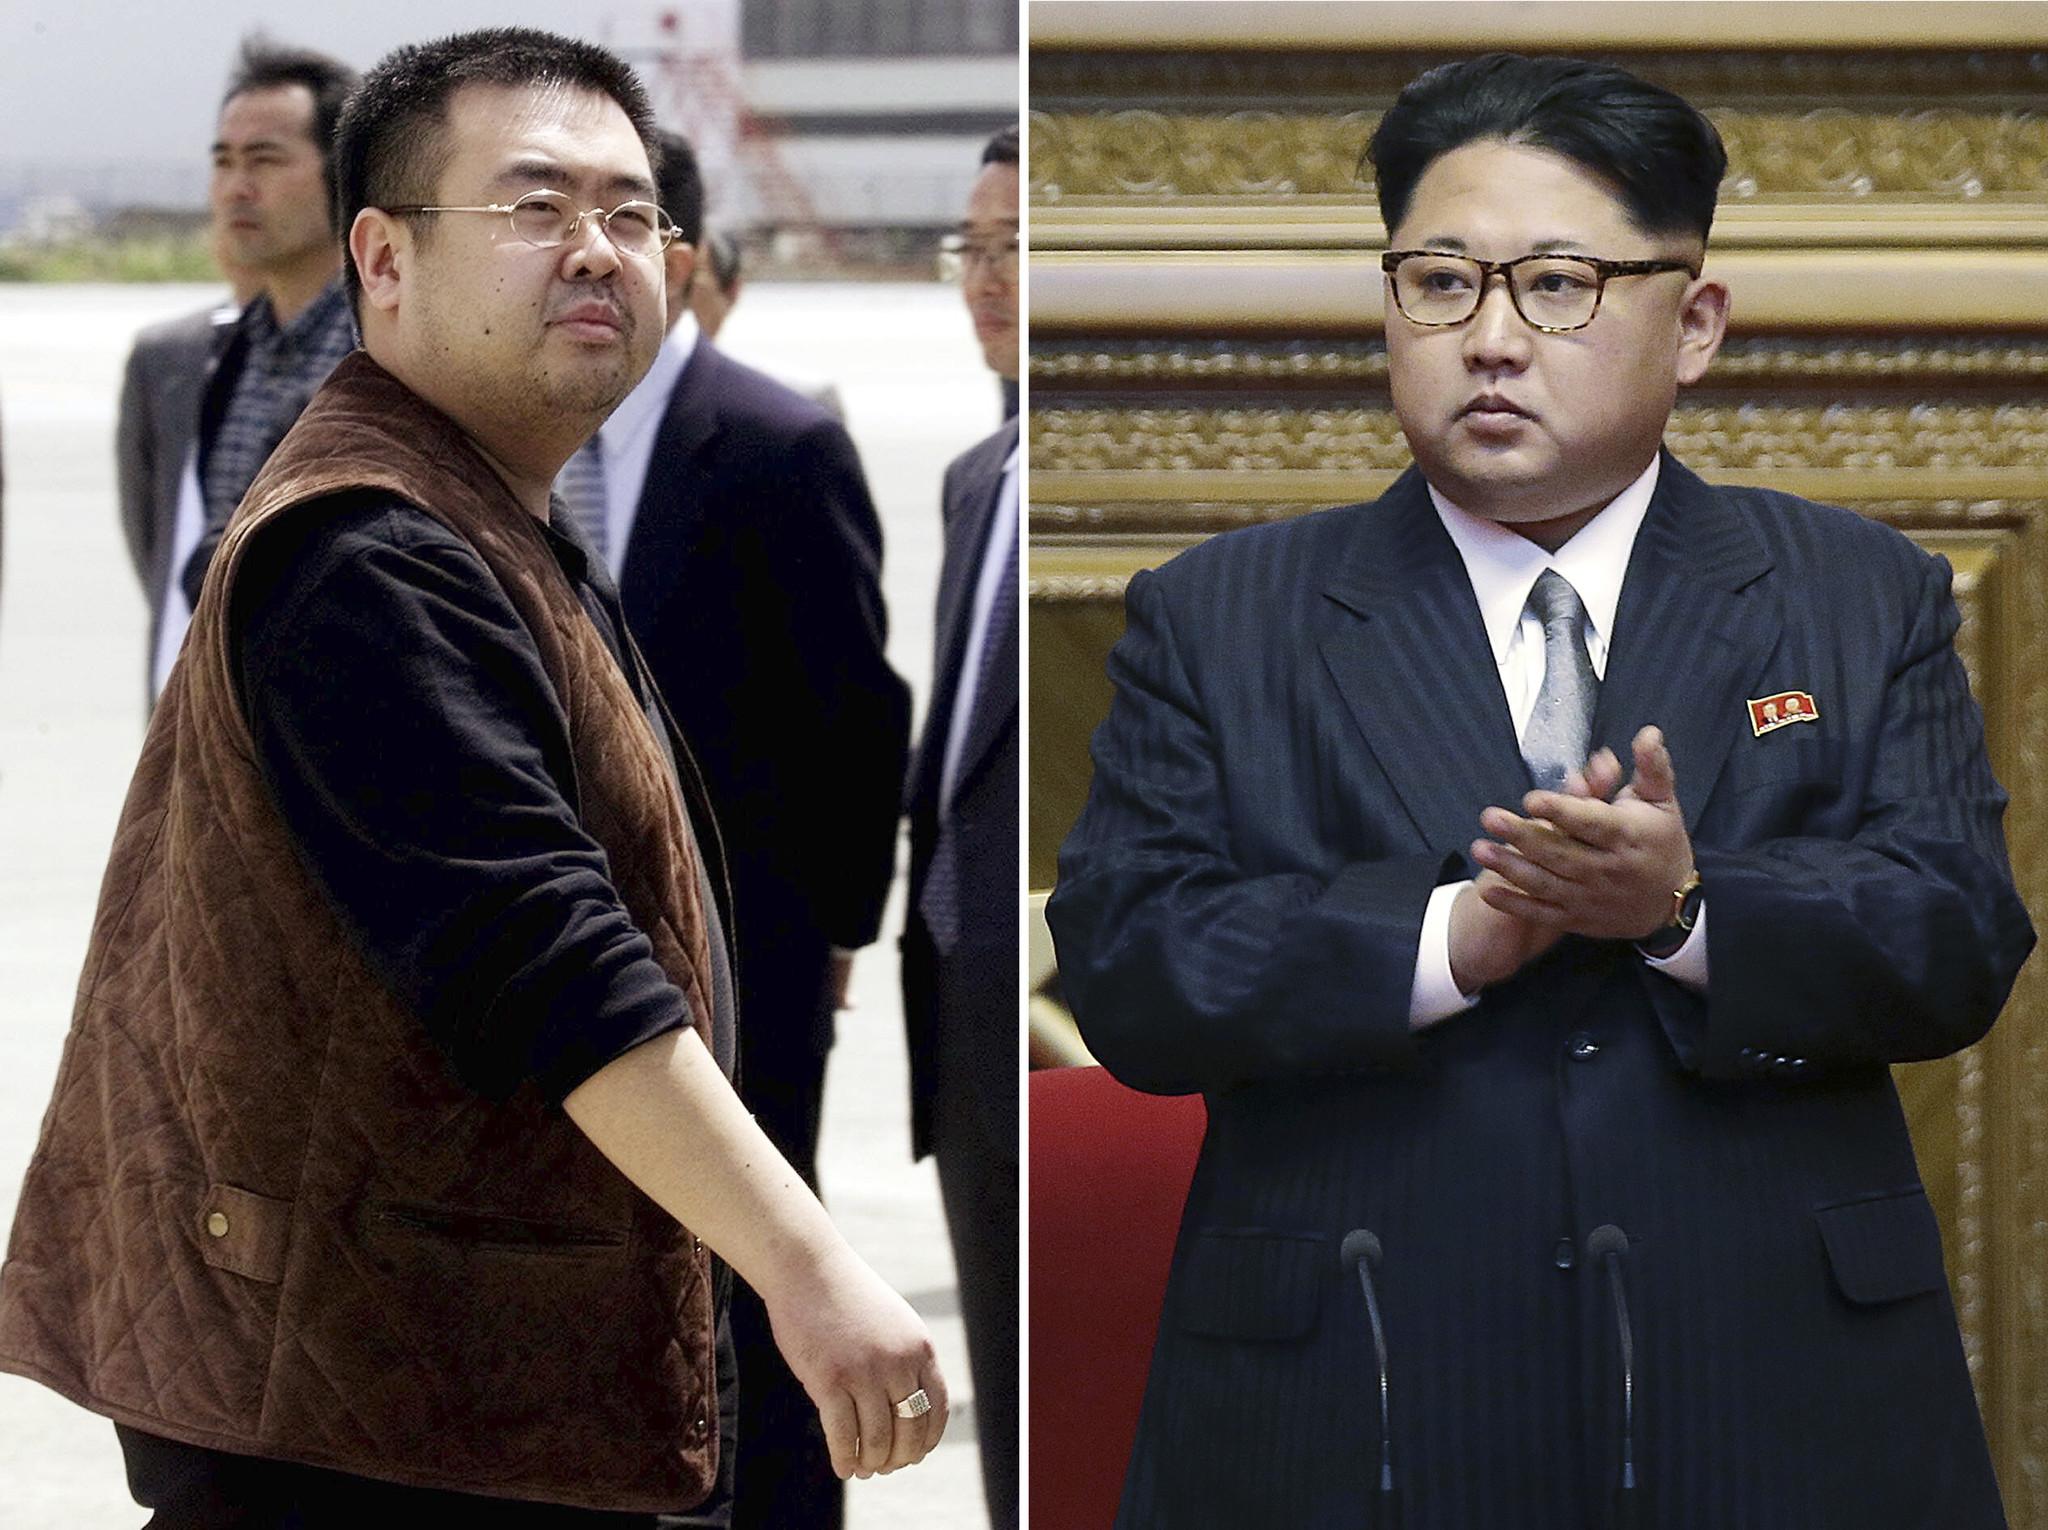 In Malaysia, stepbrother Kim Jong-un killed 14.02.2017 78